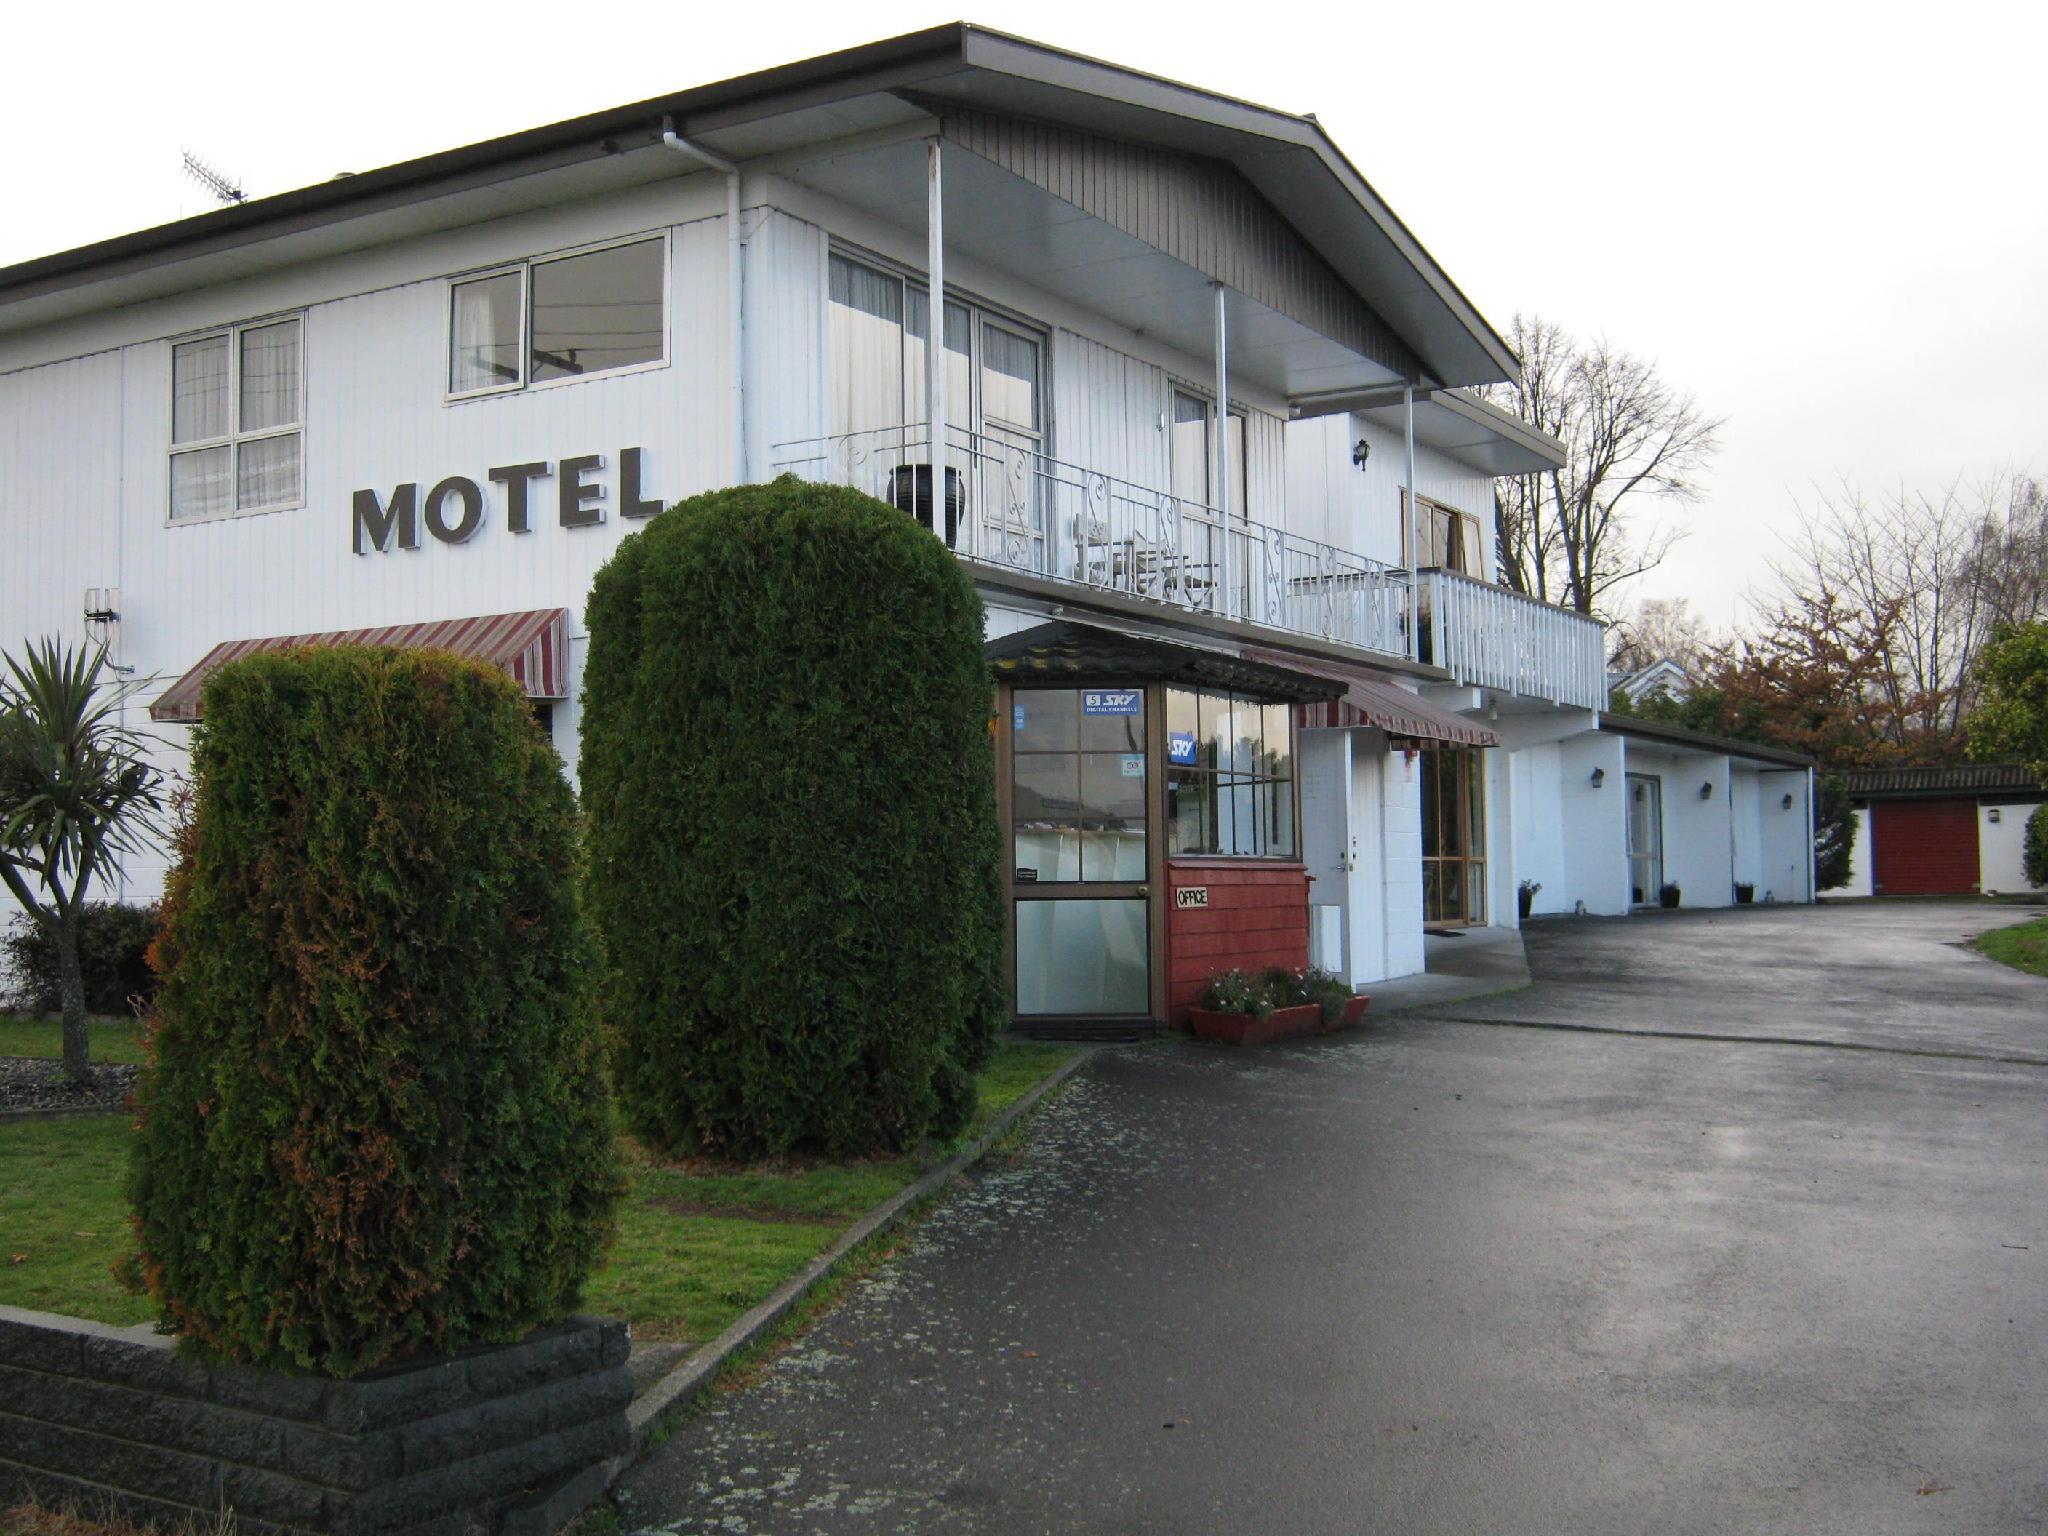 Adelphi Motel